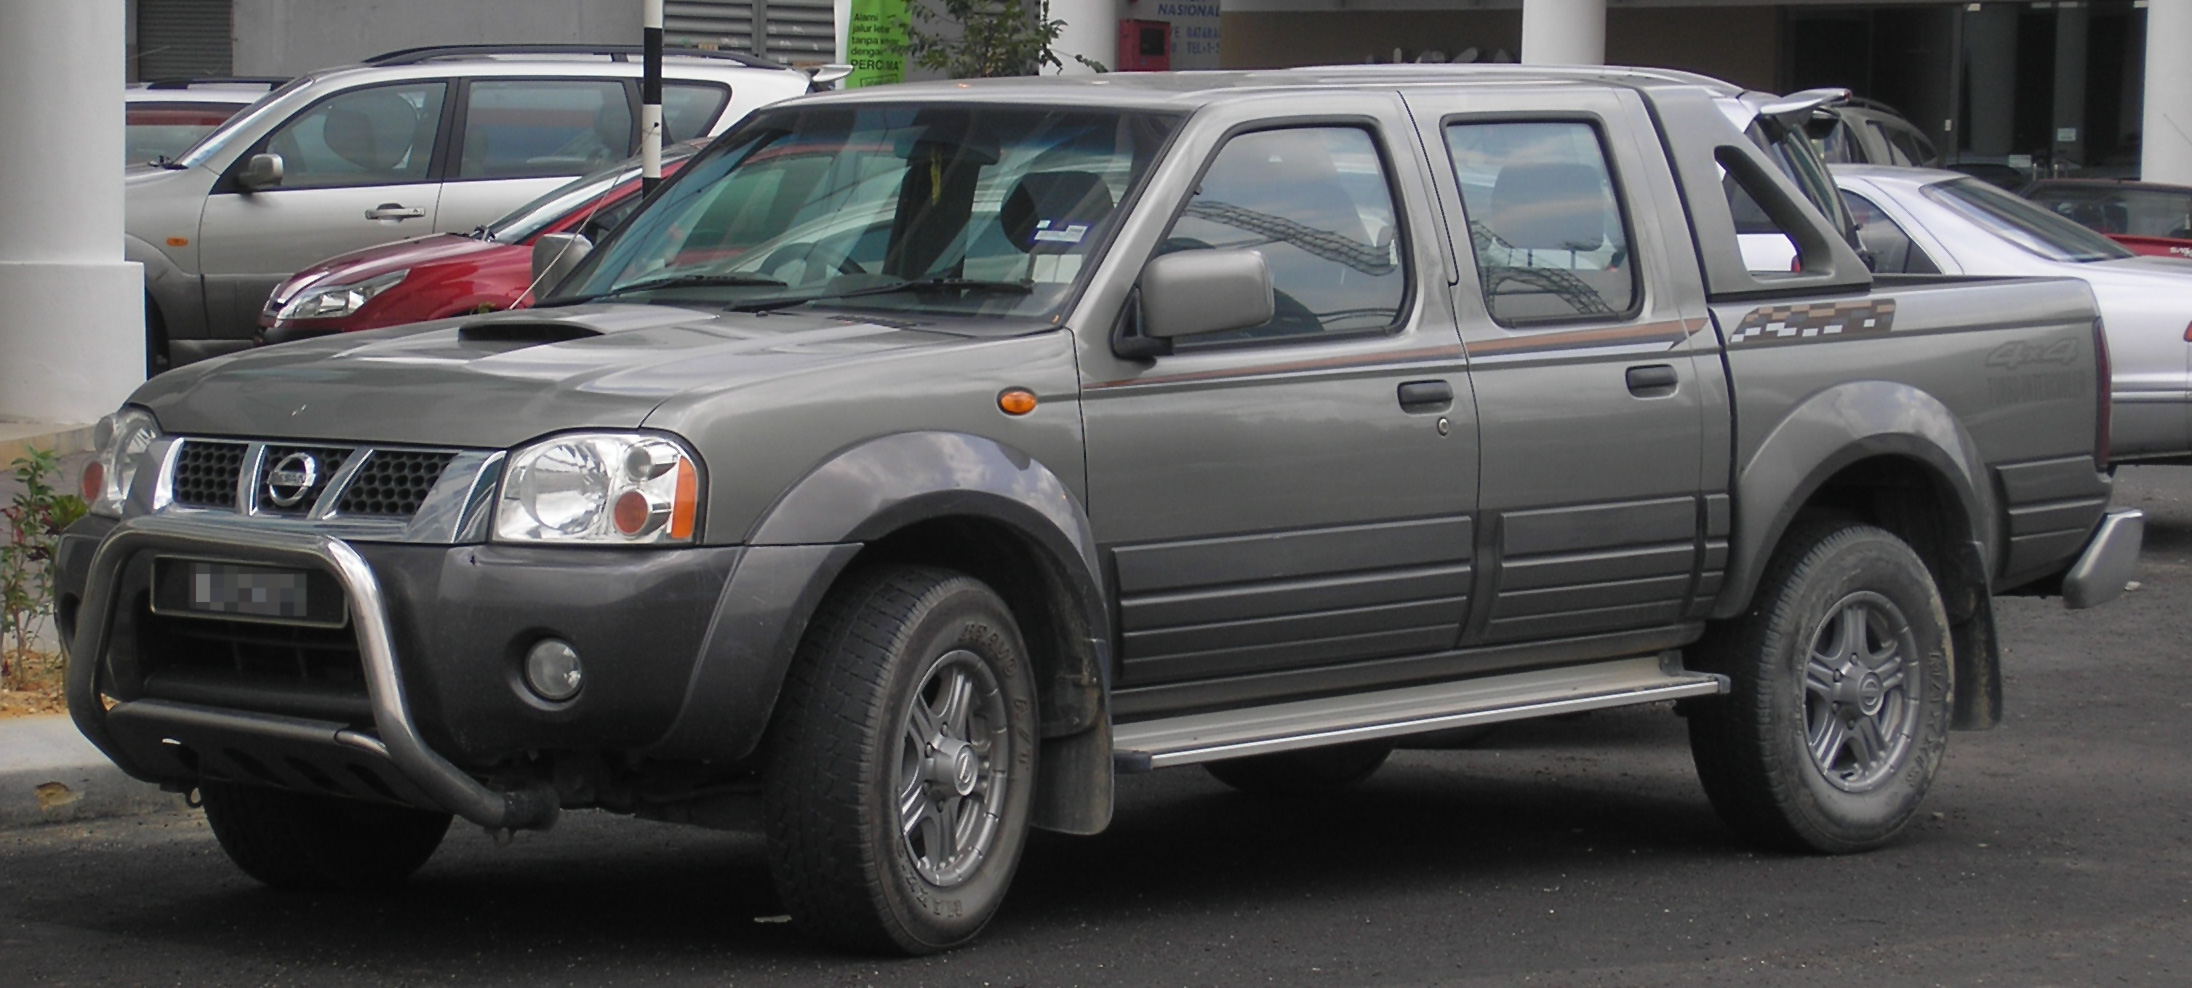 Nissan Frontier Wiki >> Nissan Frontier Wiki Best Upcoming Car Release 2020